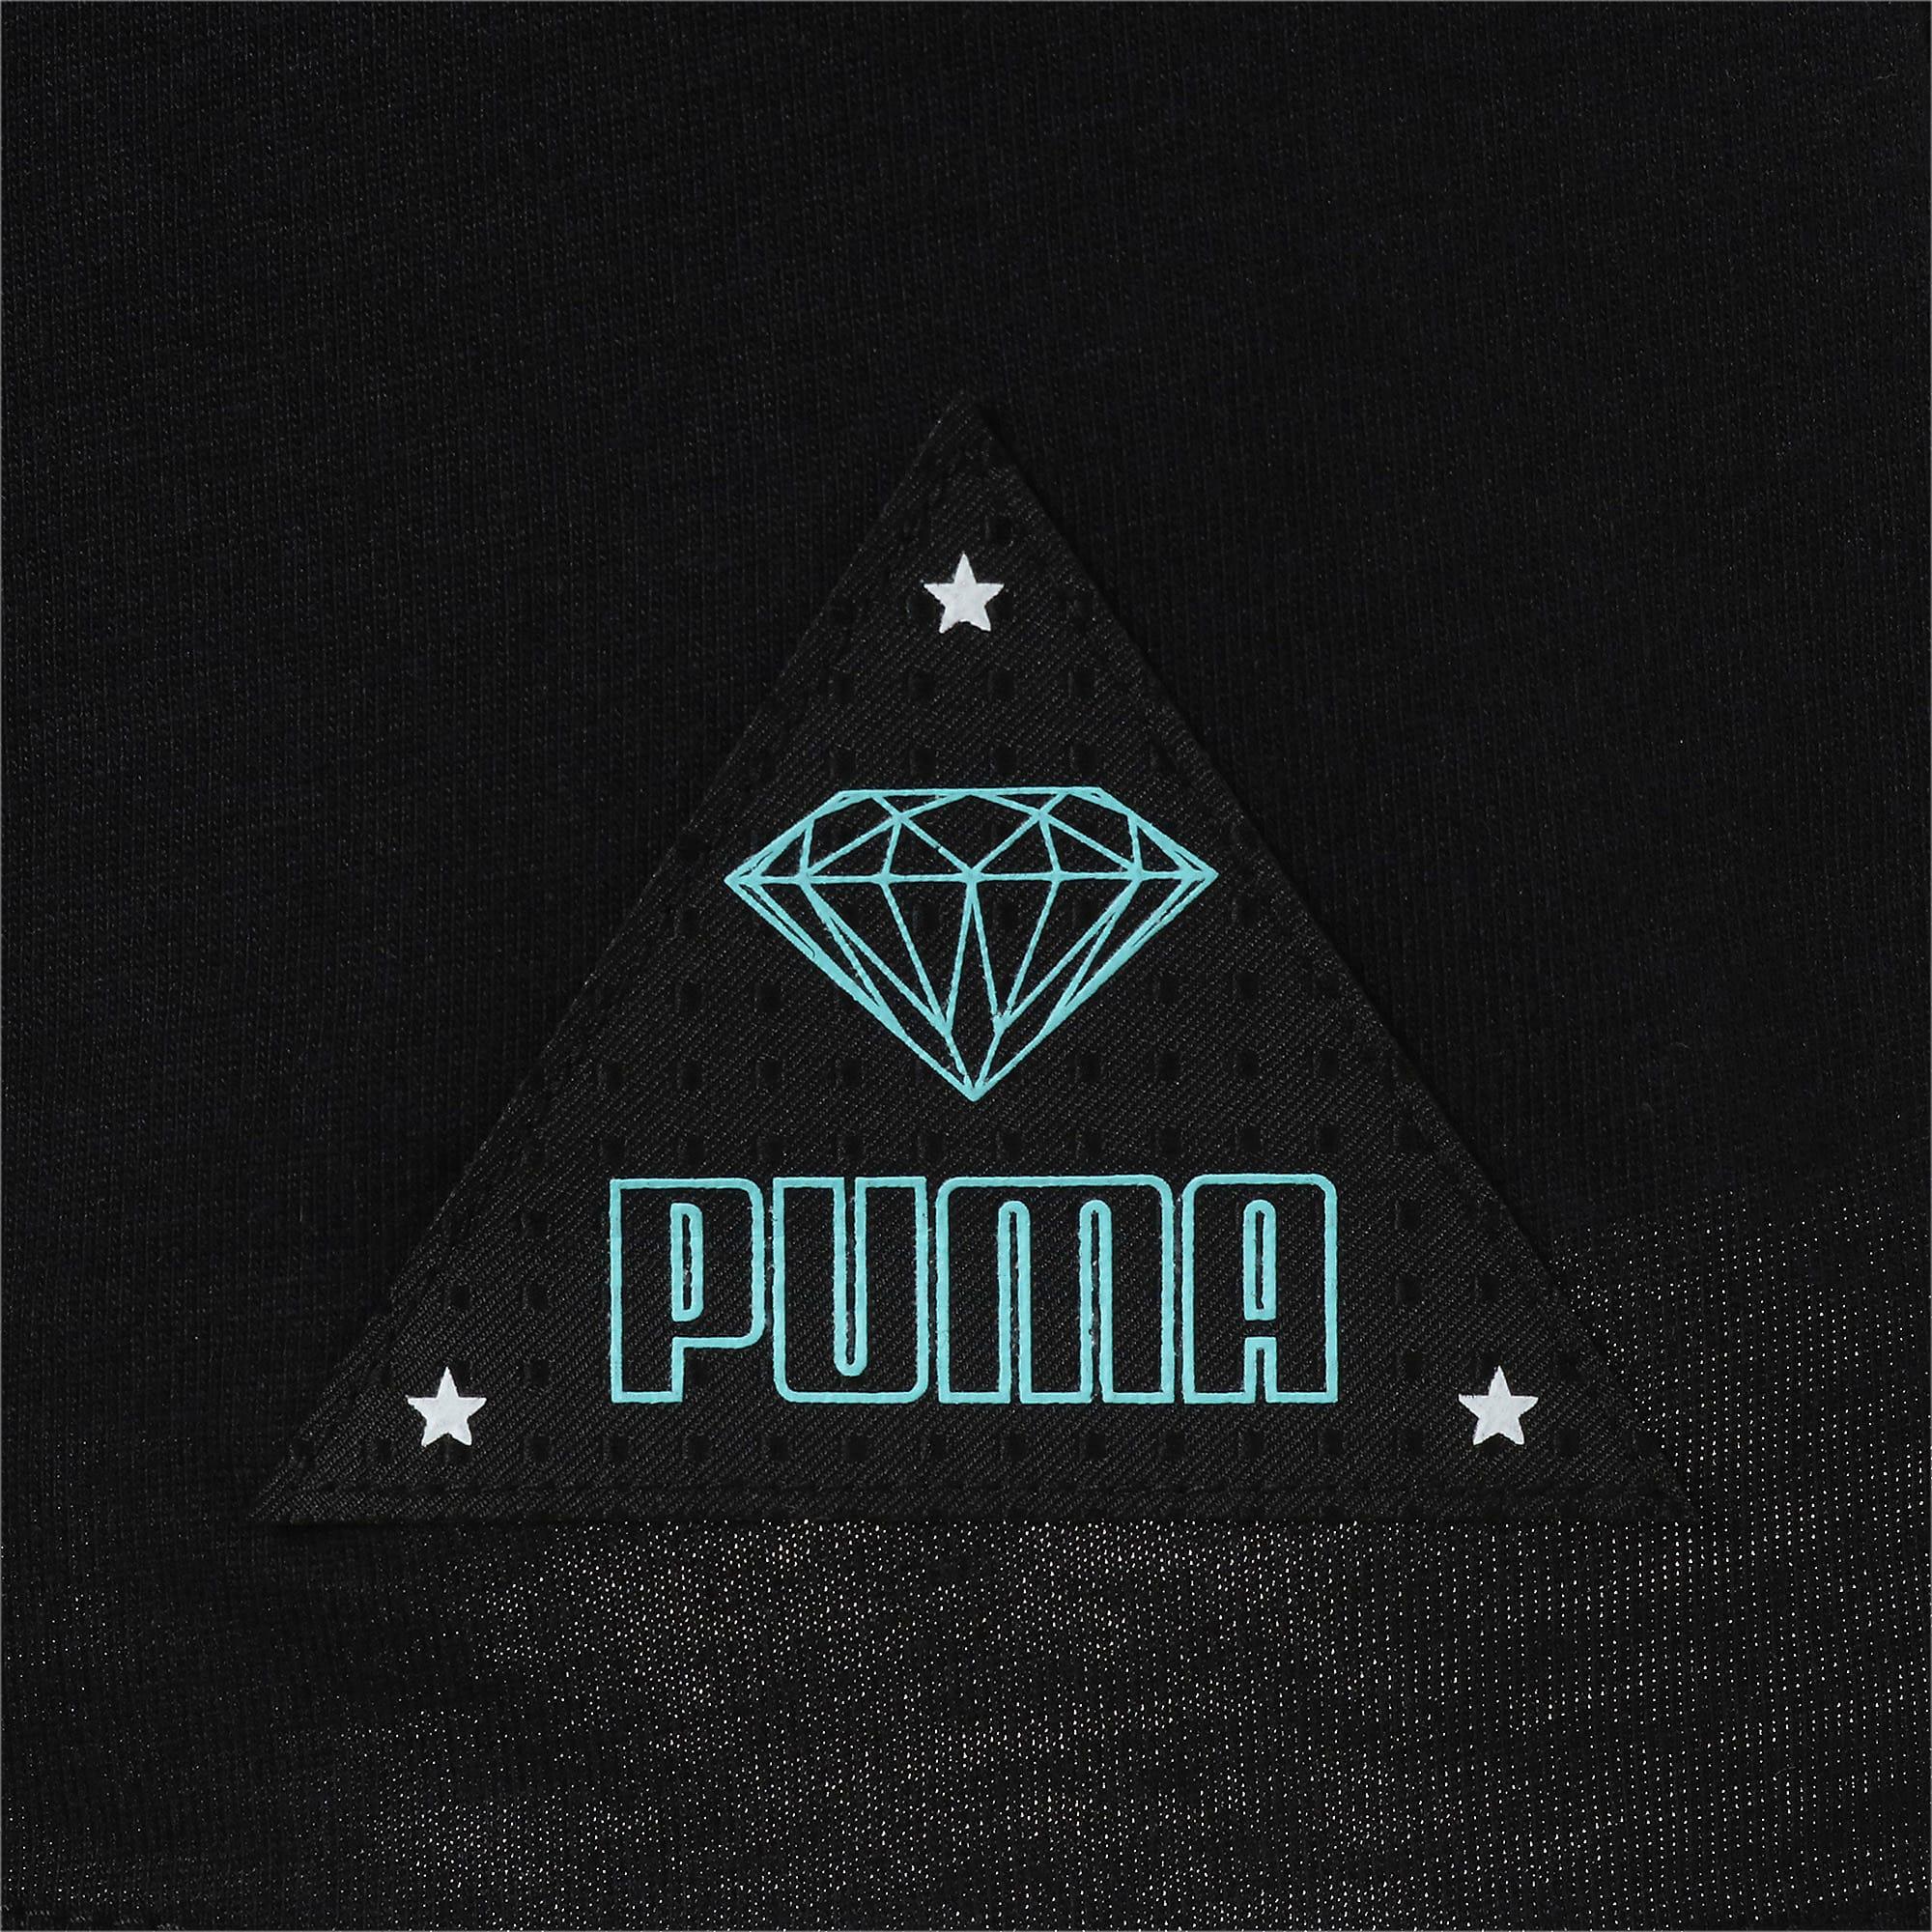 Thumbnail 8 of PUMA x DIAMOND タンク, Puma Black, medium-JPN